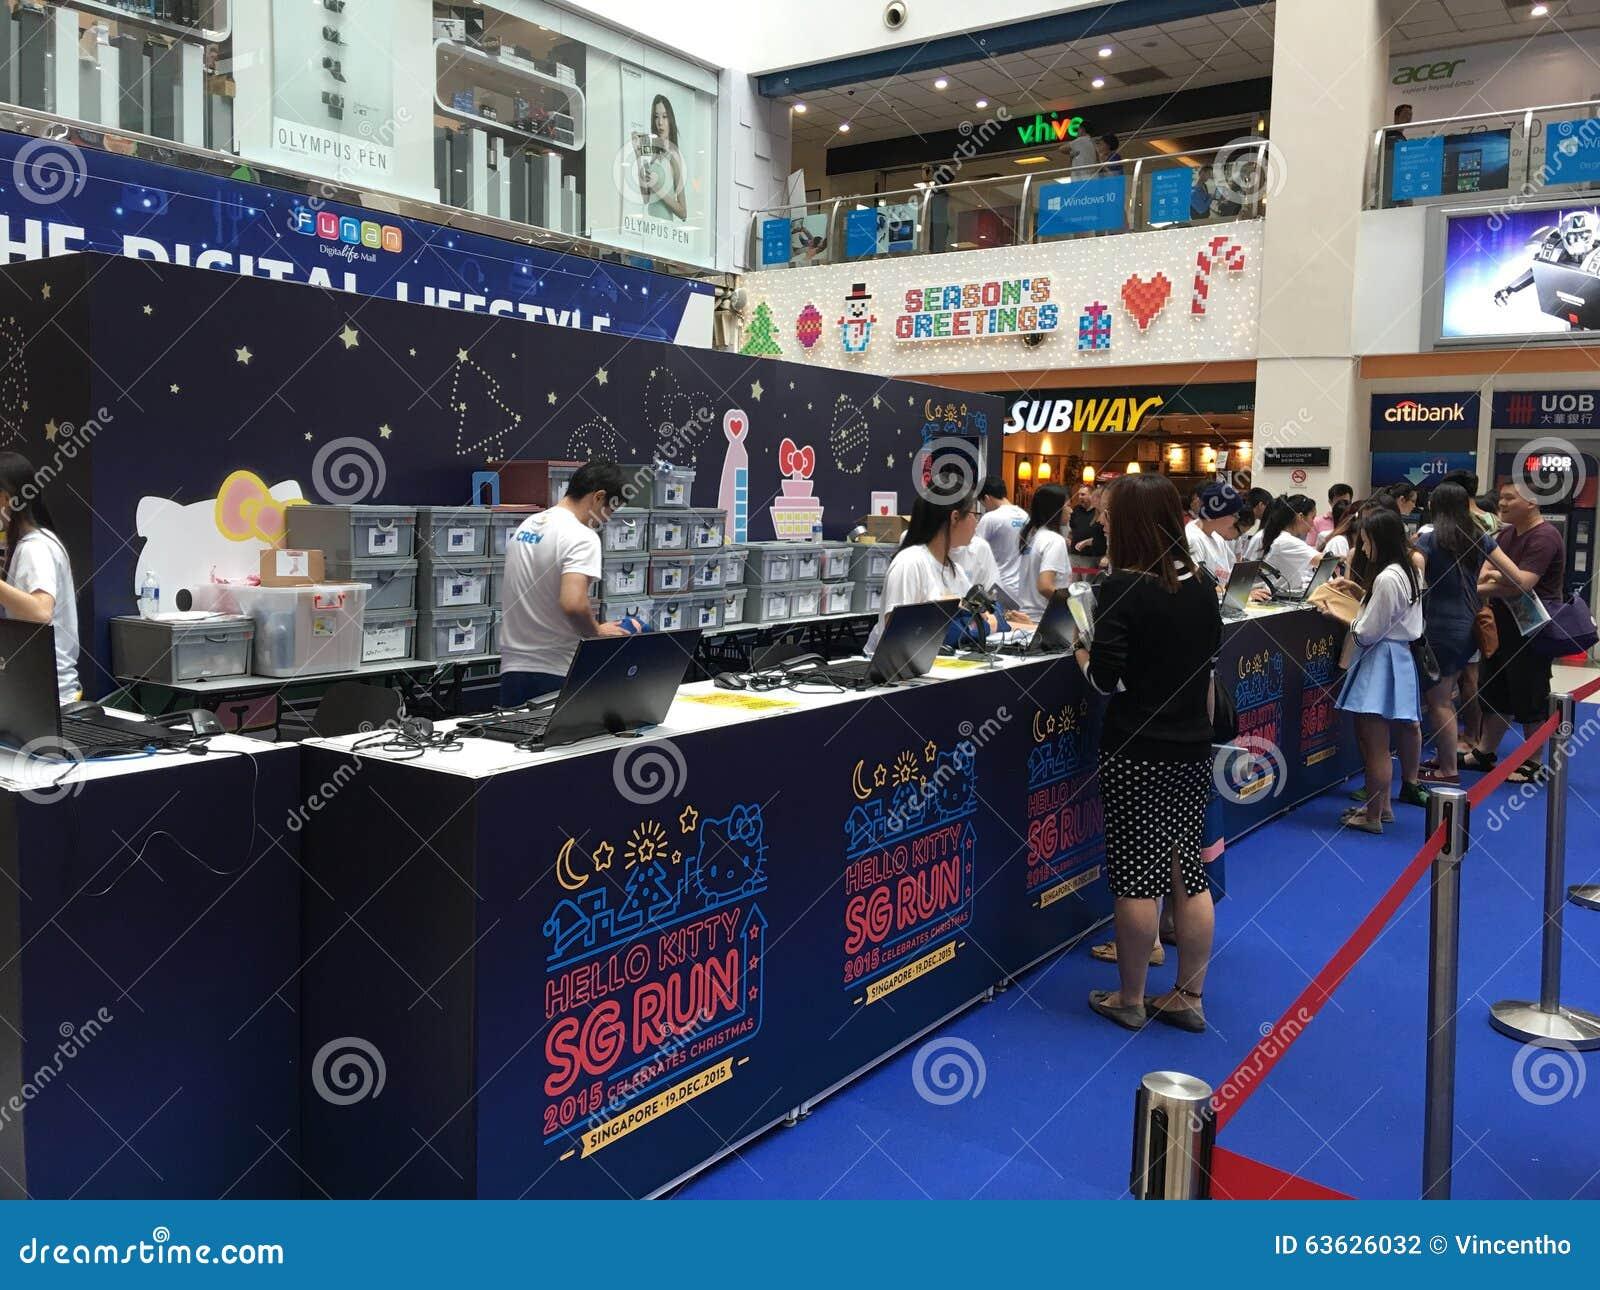 Where To Buy Hello Kitty Cake In Singapore